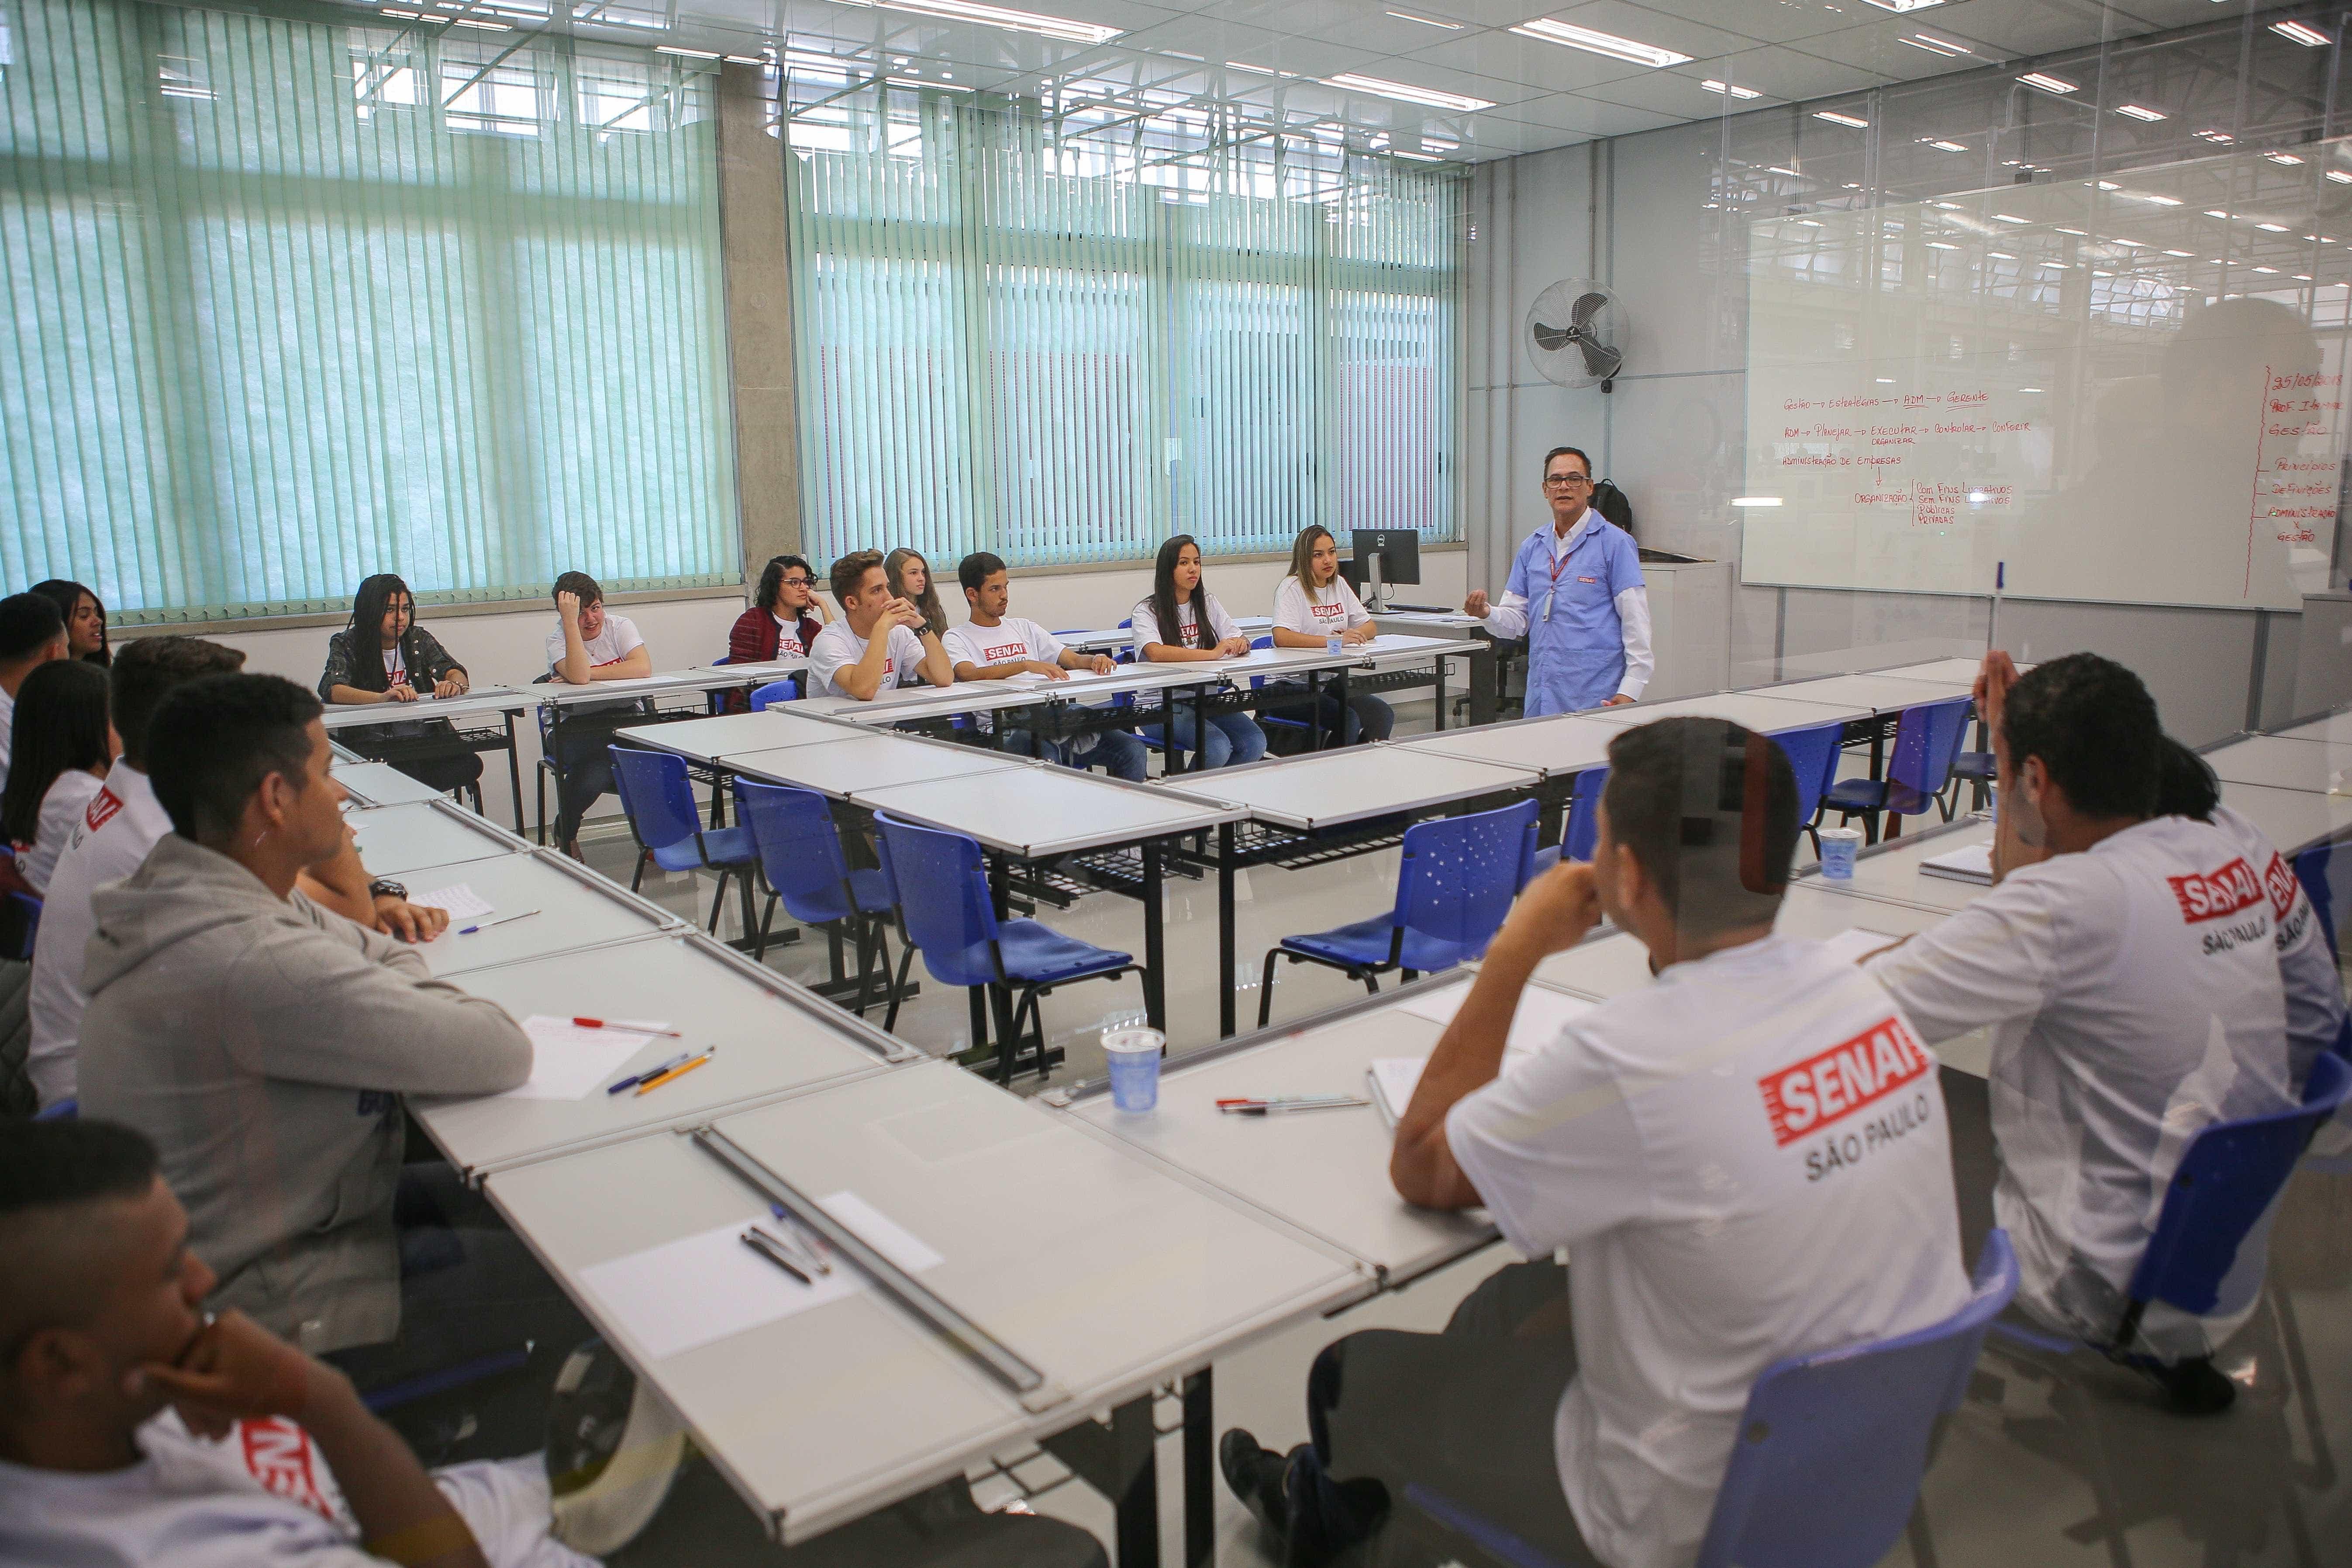 Para Sesi e Senai, corte no Sistema S pode fechar escolas